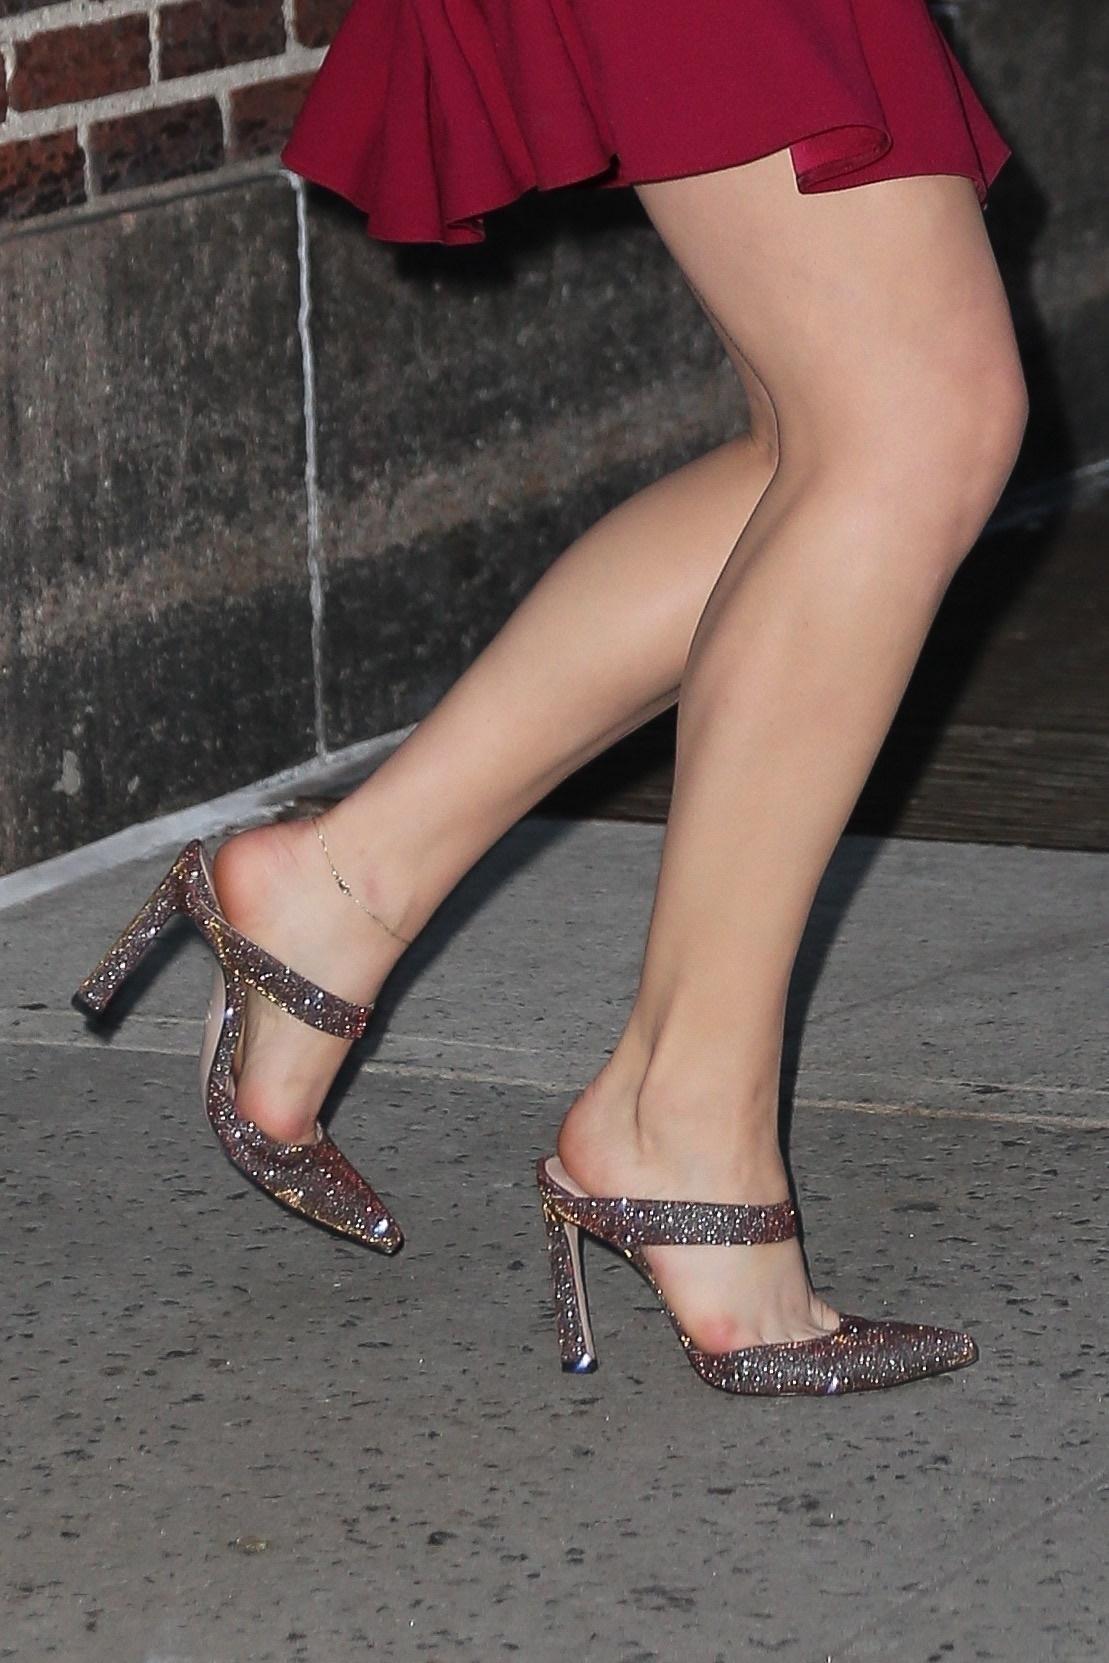 Feet Chloe Moretz naked (99 photos), Tits, Sideboobs, Boobs, legs 2020